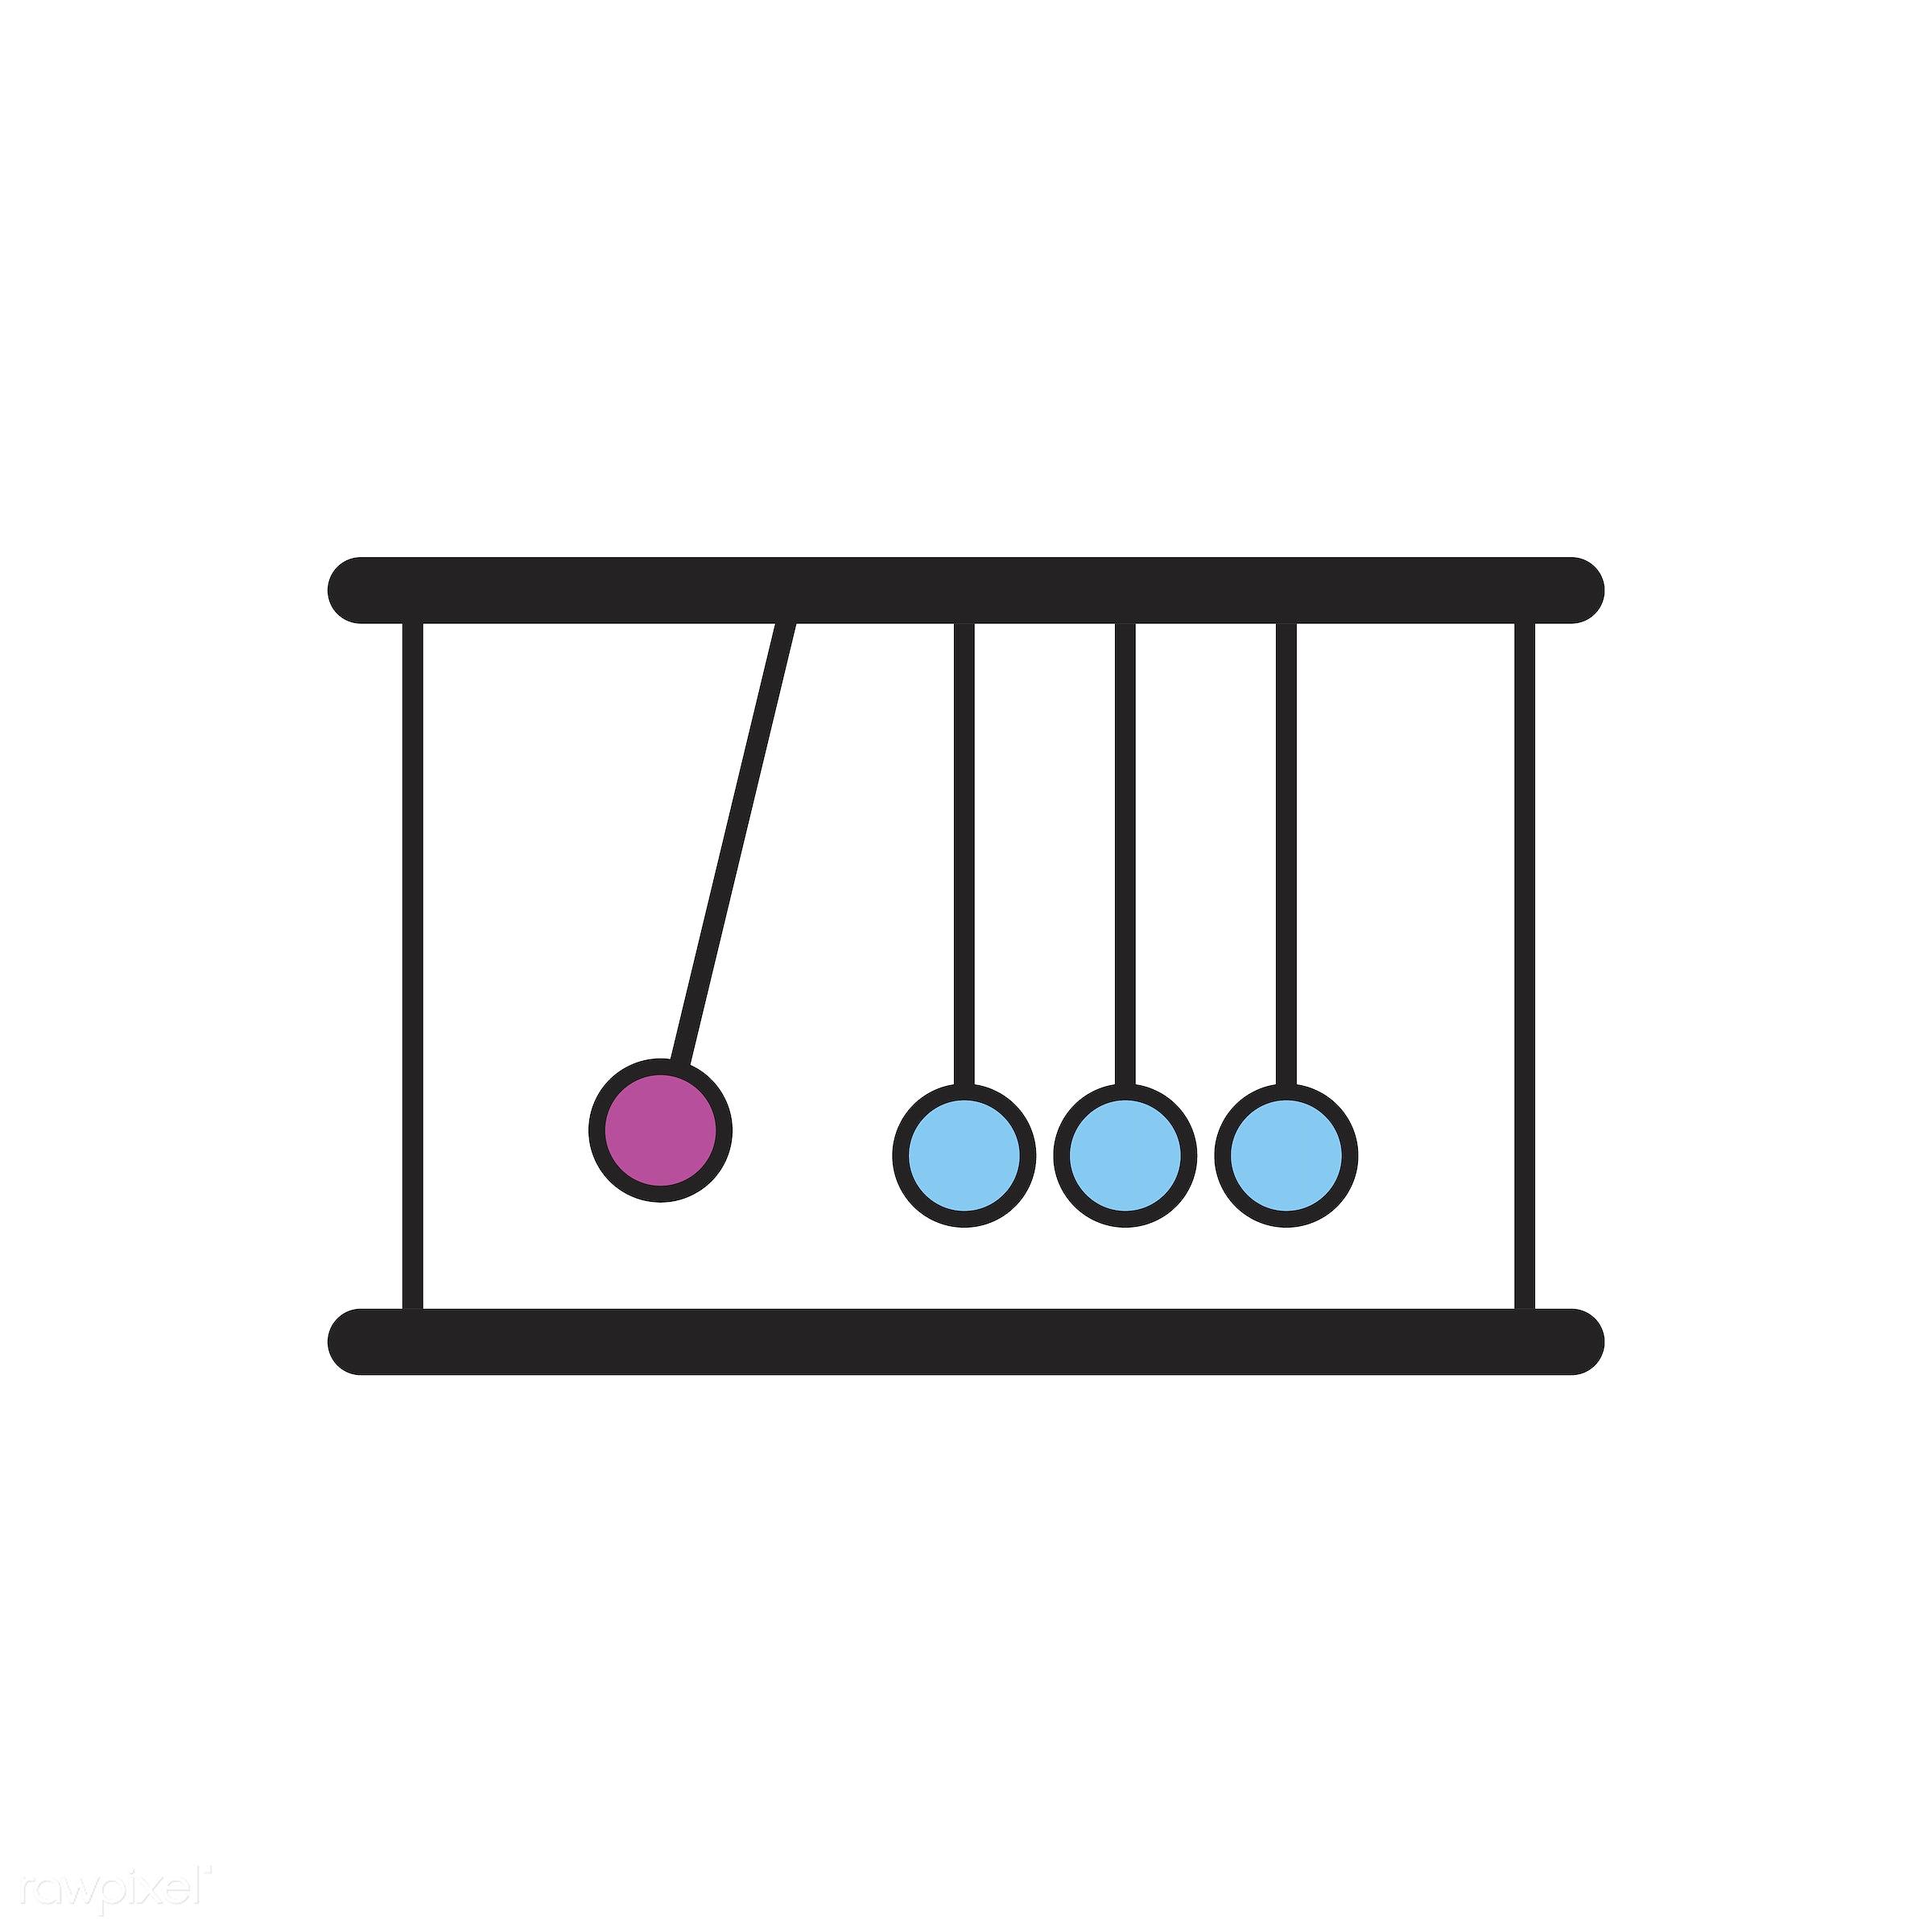 Illustration of Newton's cradle balls - ball, cradle, design, education, equipment, experiments, graphic, gravity, hit, icon...